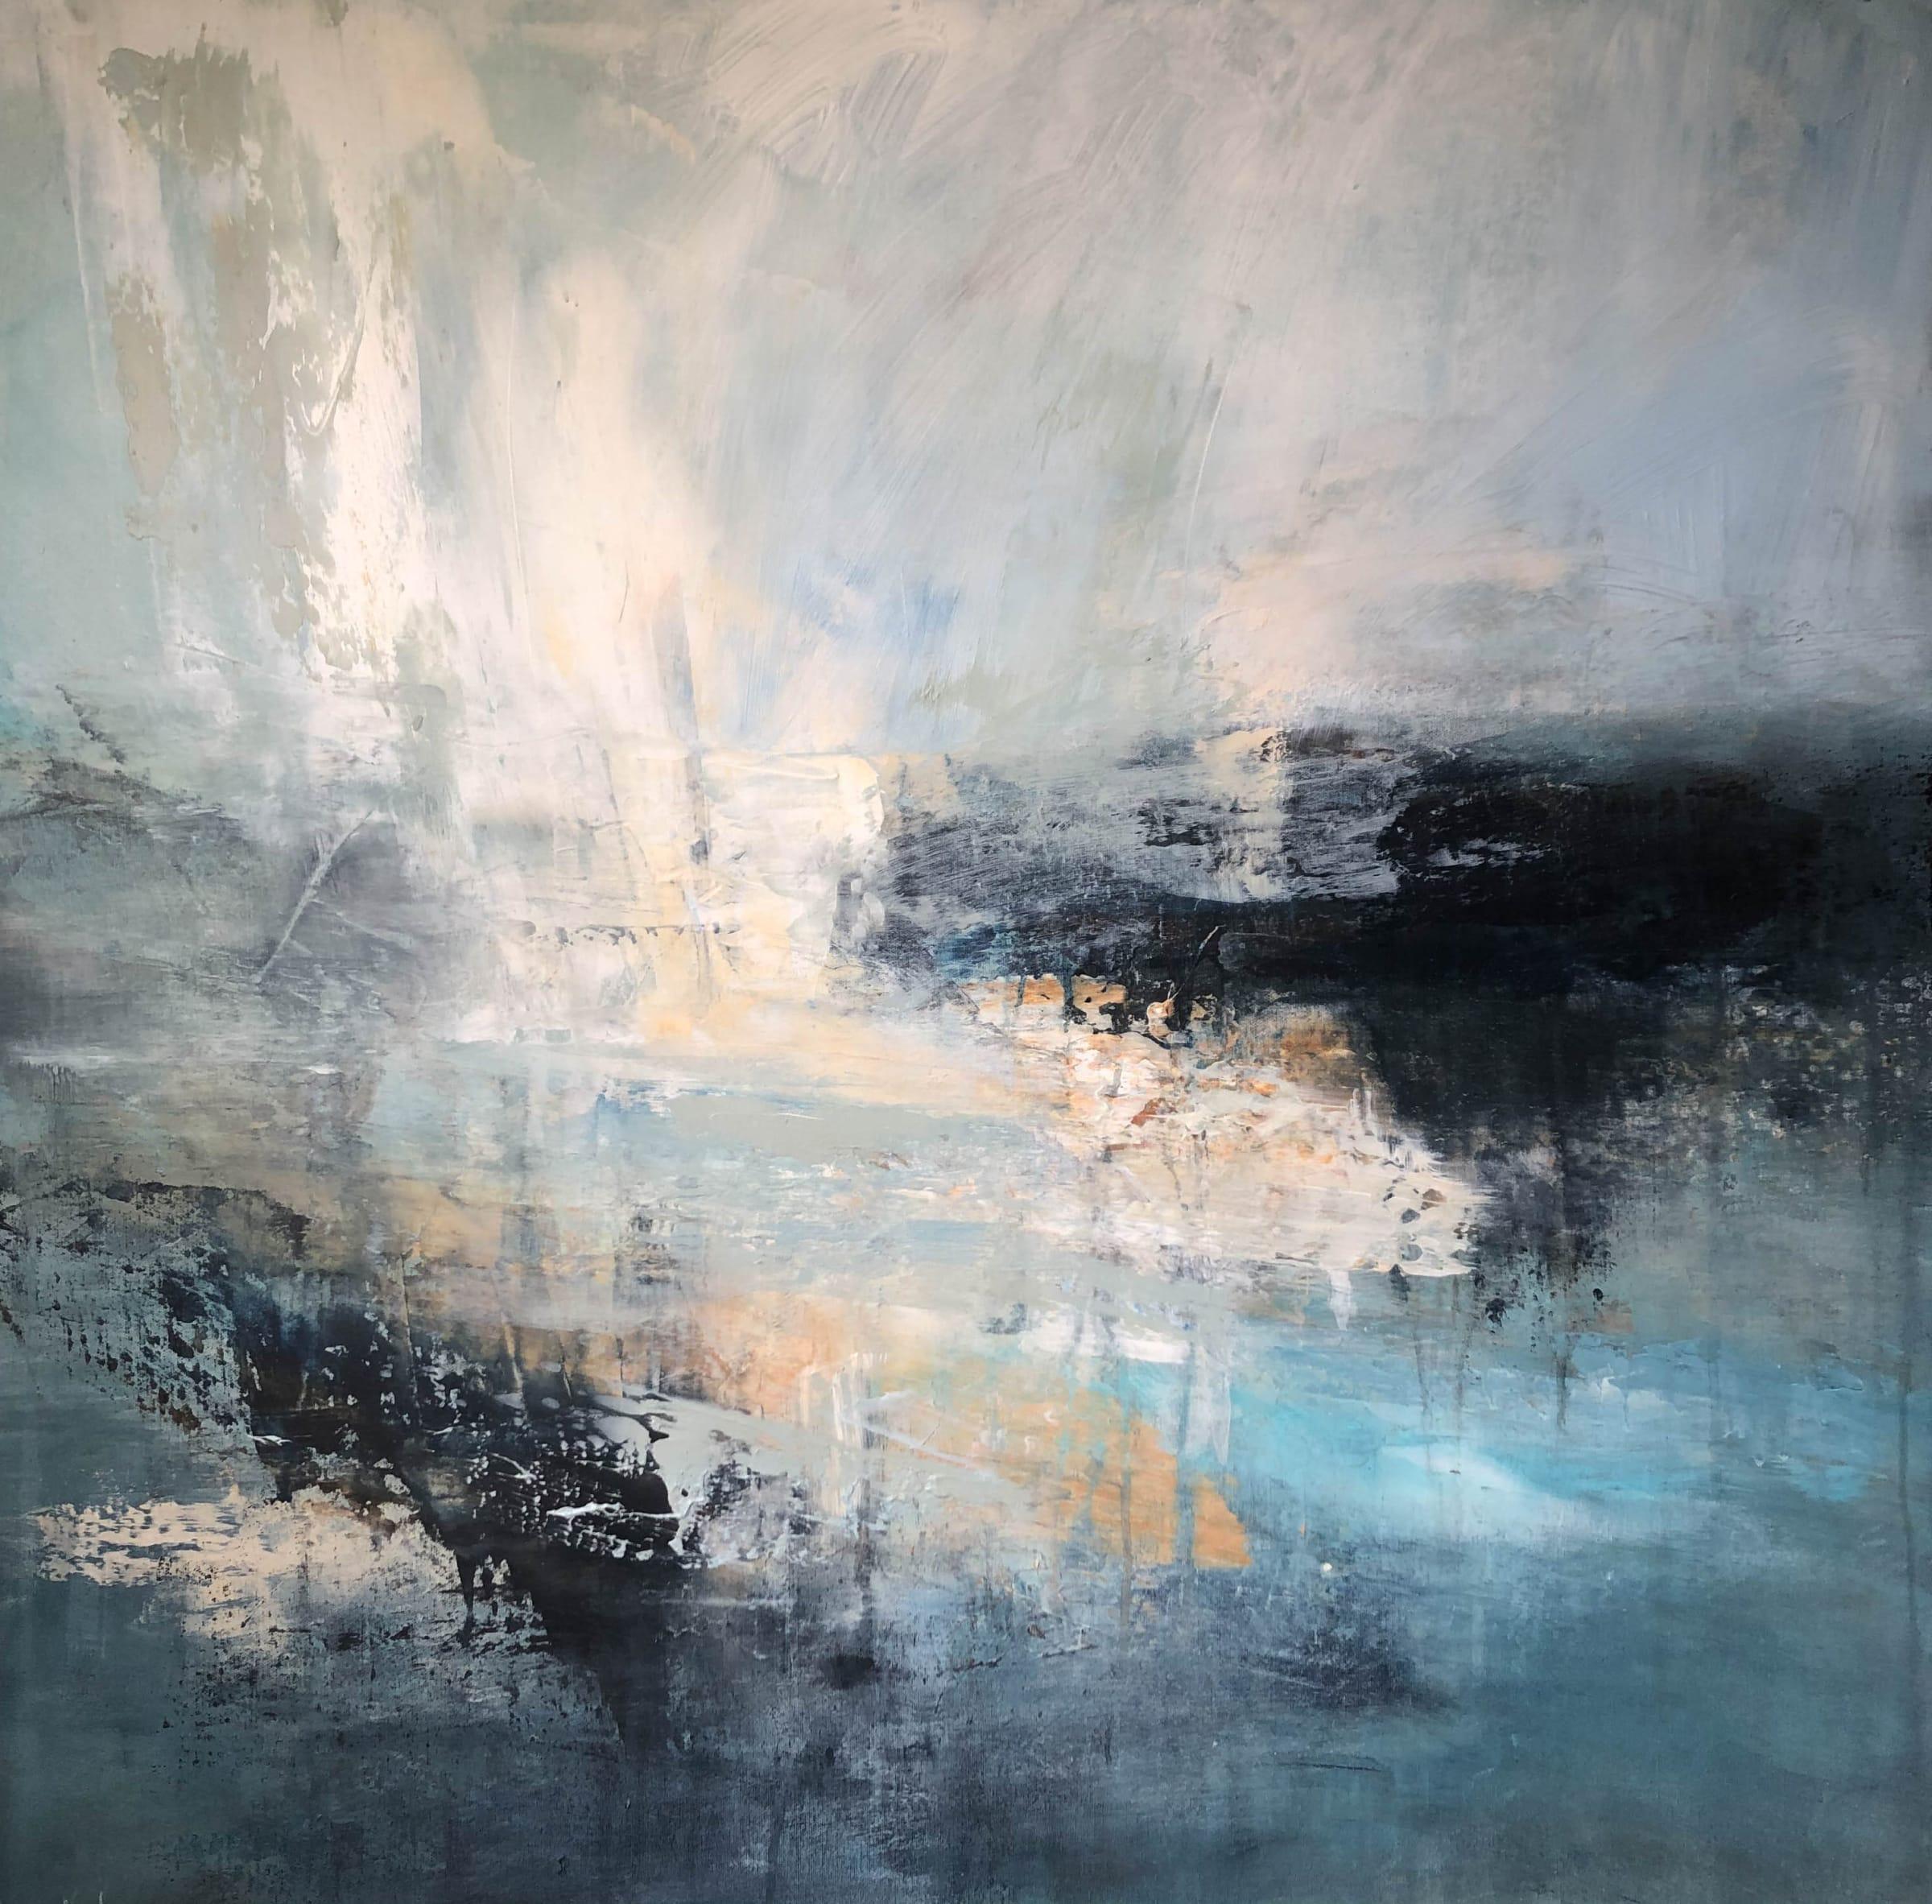 "<span class=""link fancybox-details-link""><a href=""/artists/41-erin-ward/works/7218-erin-ward-summer-rain-2020/"">View Detail Page</a></span><div class=""artist""><strong>Erin Ward</strong></div> b. 1966 <div class=""title""><em>Summer Rain</em>, 2020</div> <div class=""medium"">acrylic on canvas</div> <div class=""dimensions"">h. 92 cm x w. 92 cm</div><div class=""price"">£1,790.00</div><div class=""copyright_line"">Ownart: £179 x 10 Months, 0% APR</div>"